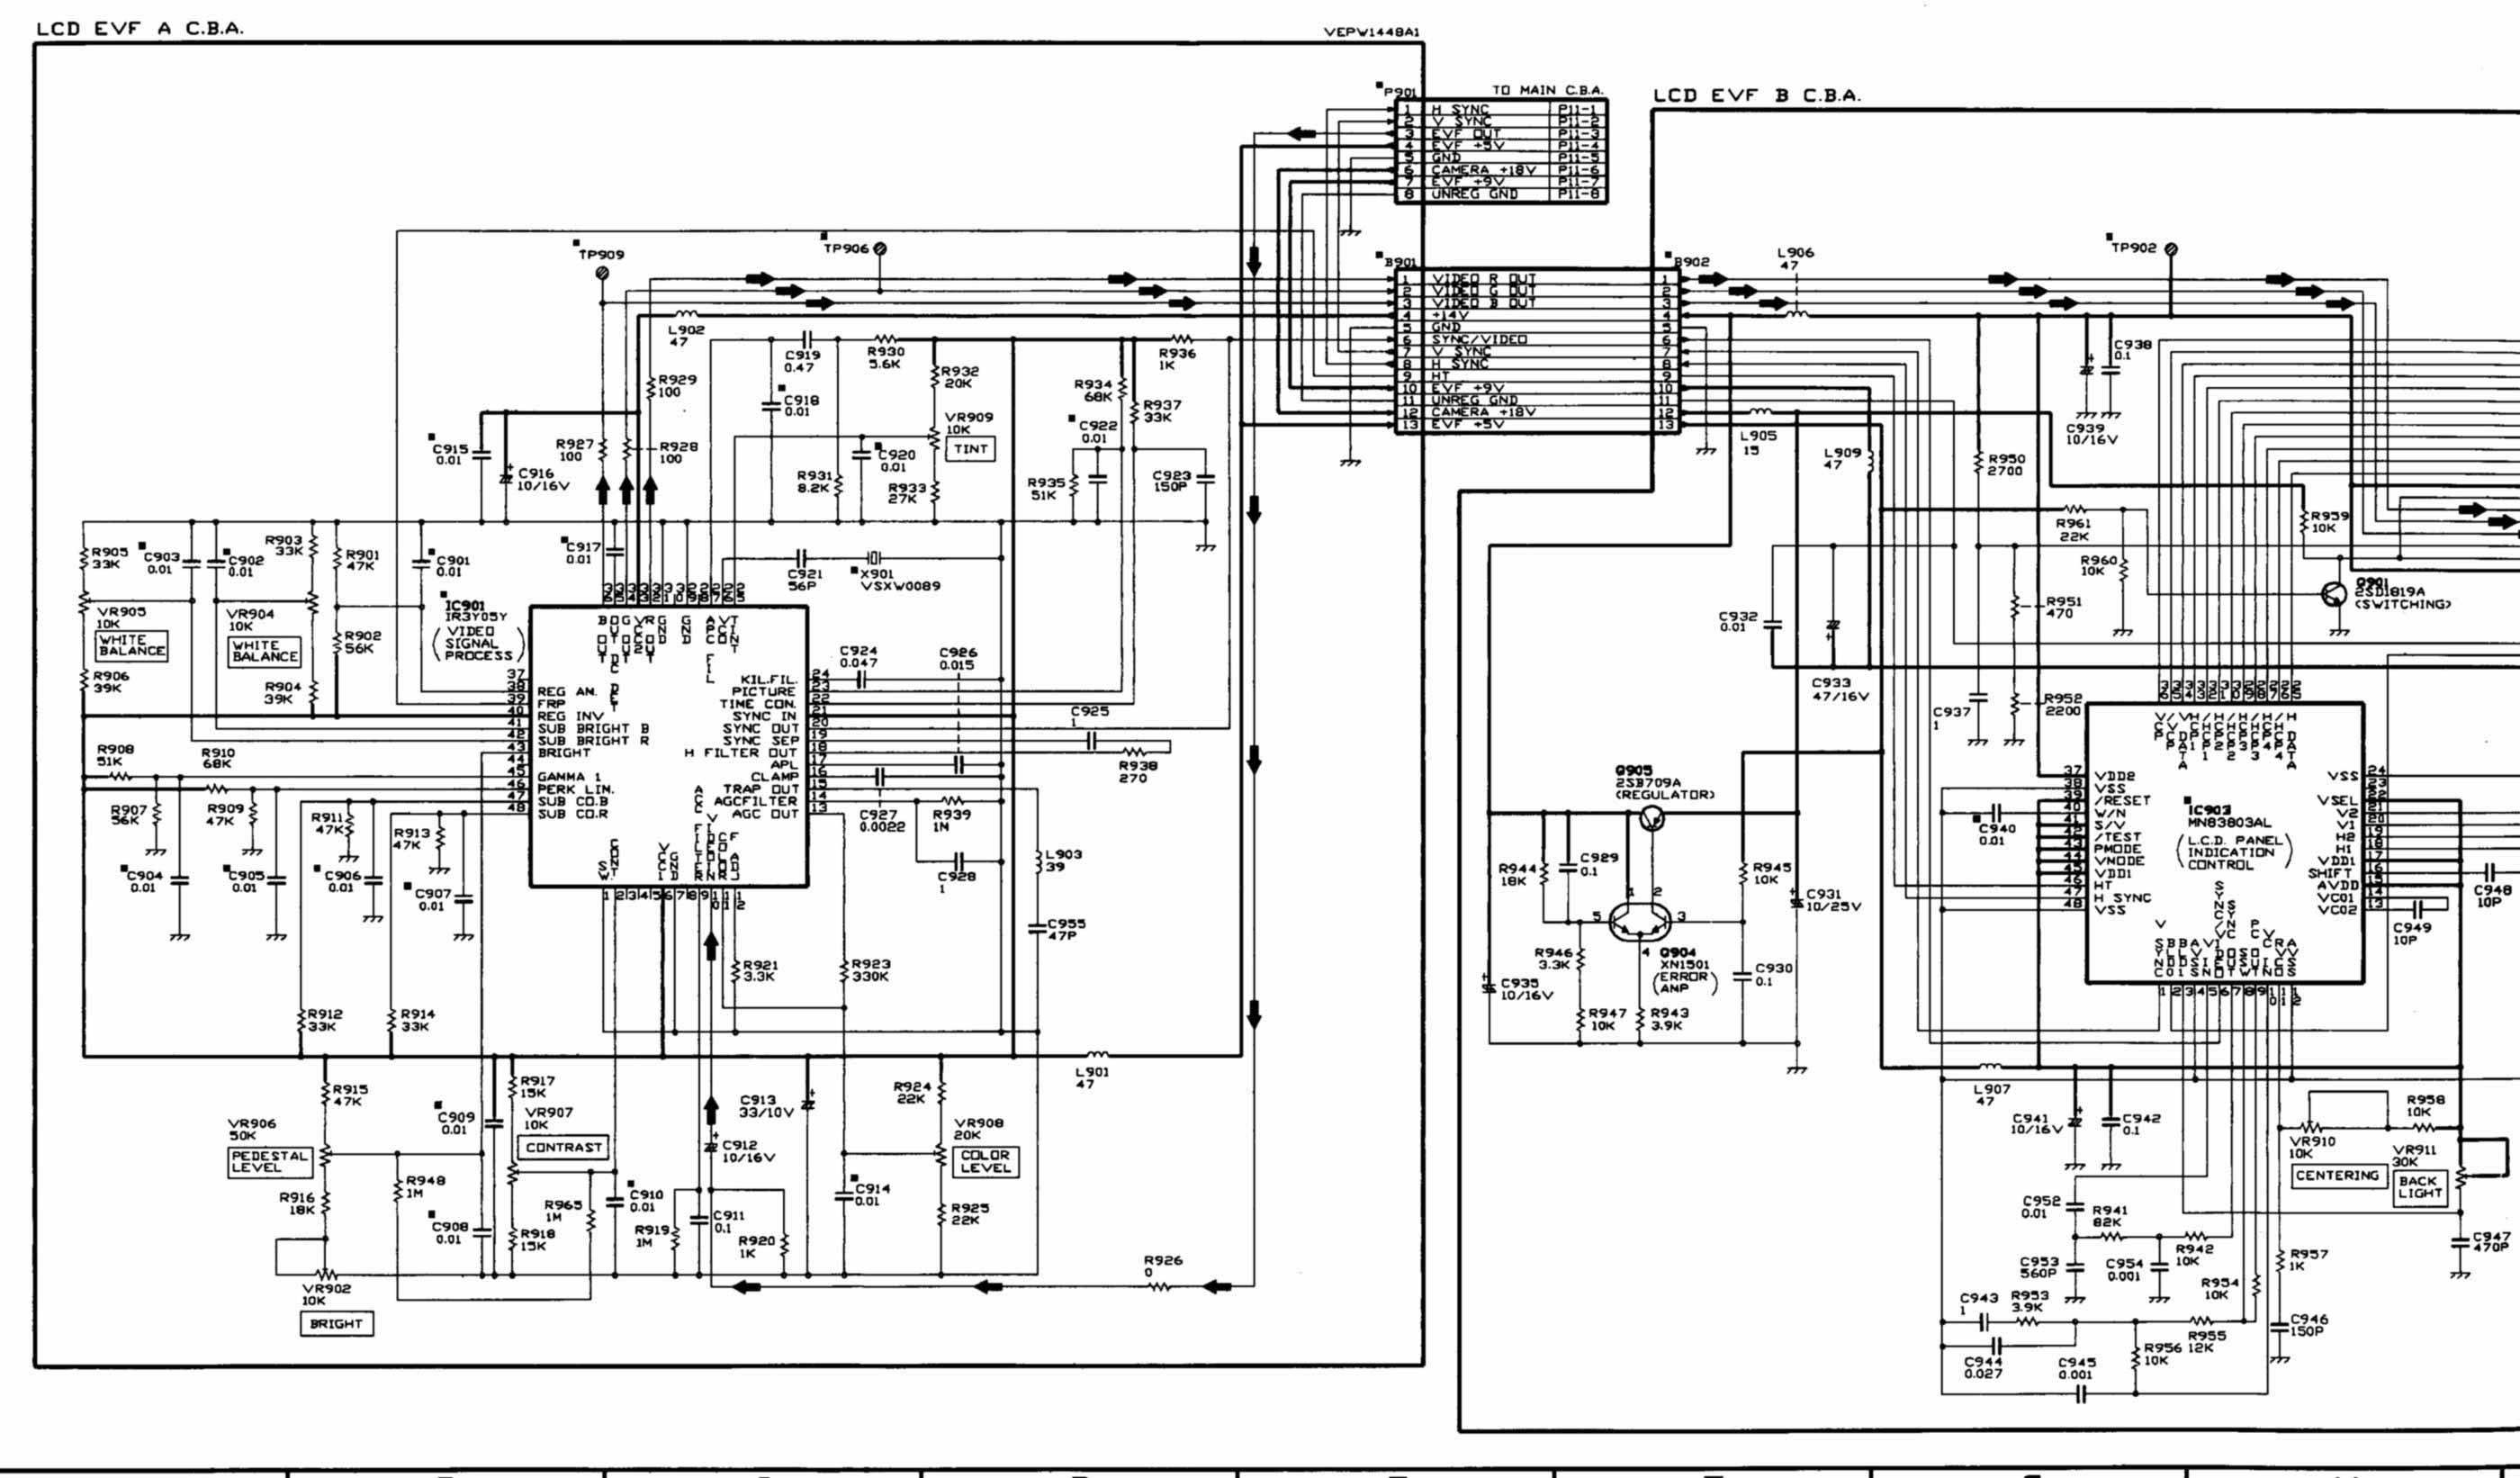 Vfx1 Vga Linkbox Plans